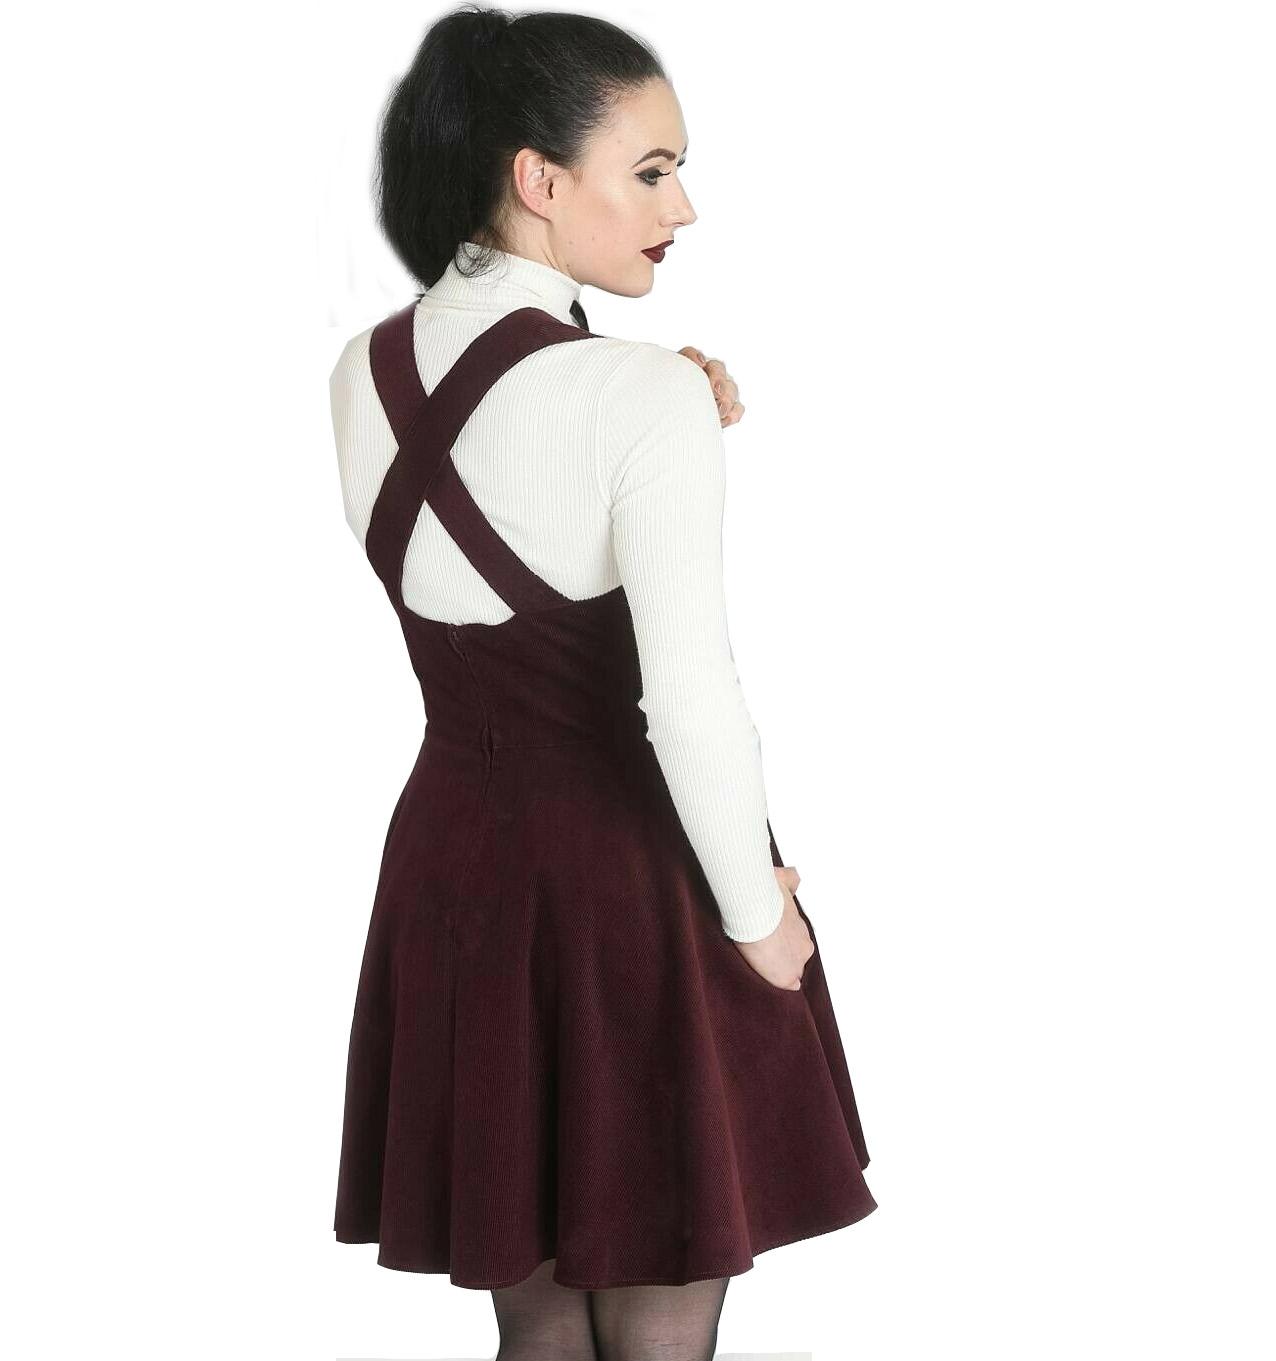 Hell-Bunny-Rockabilly-Corduroy-Mini-Dress-WONDER-YEARS-Pinafore-Wine-All-Sizes thumbnail 13